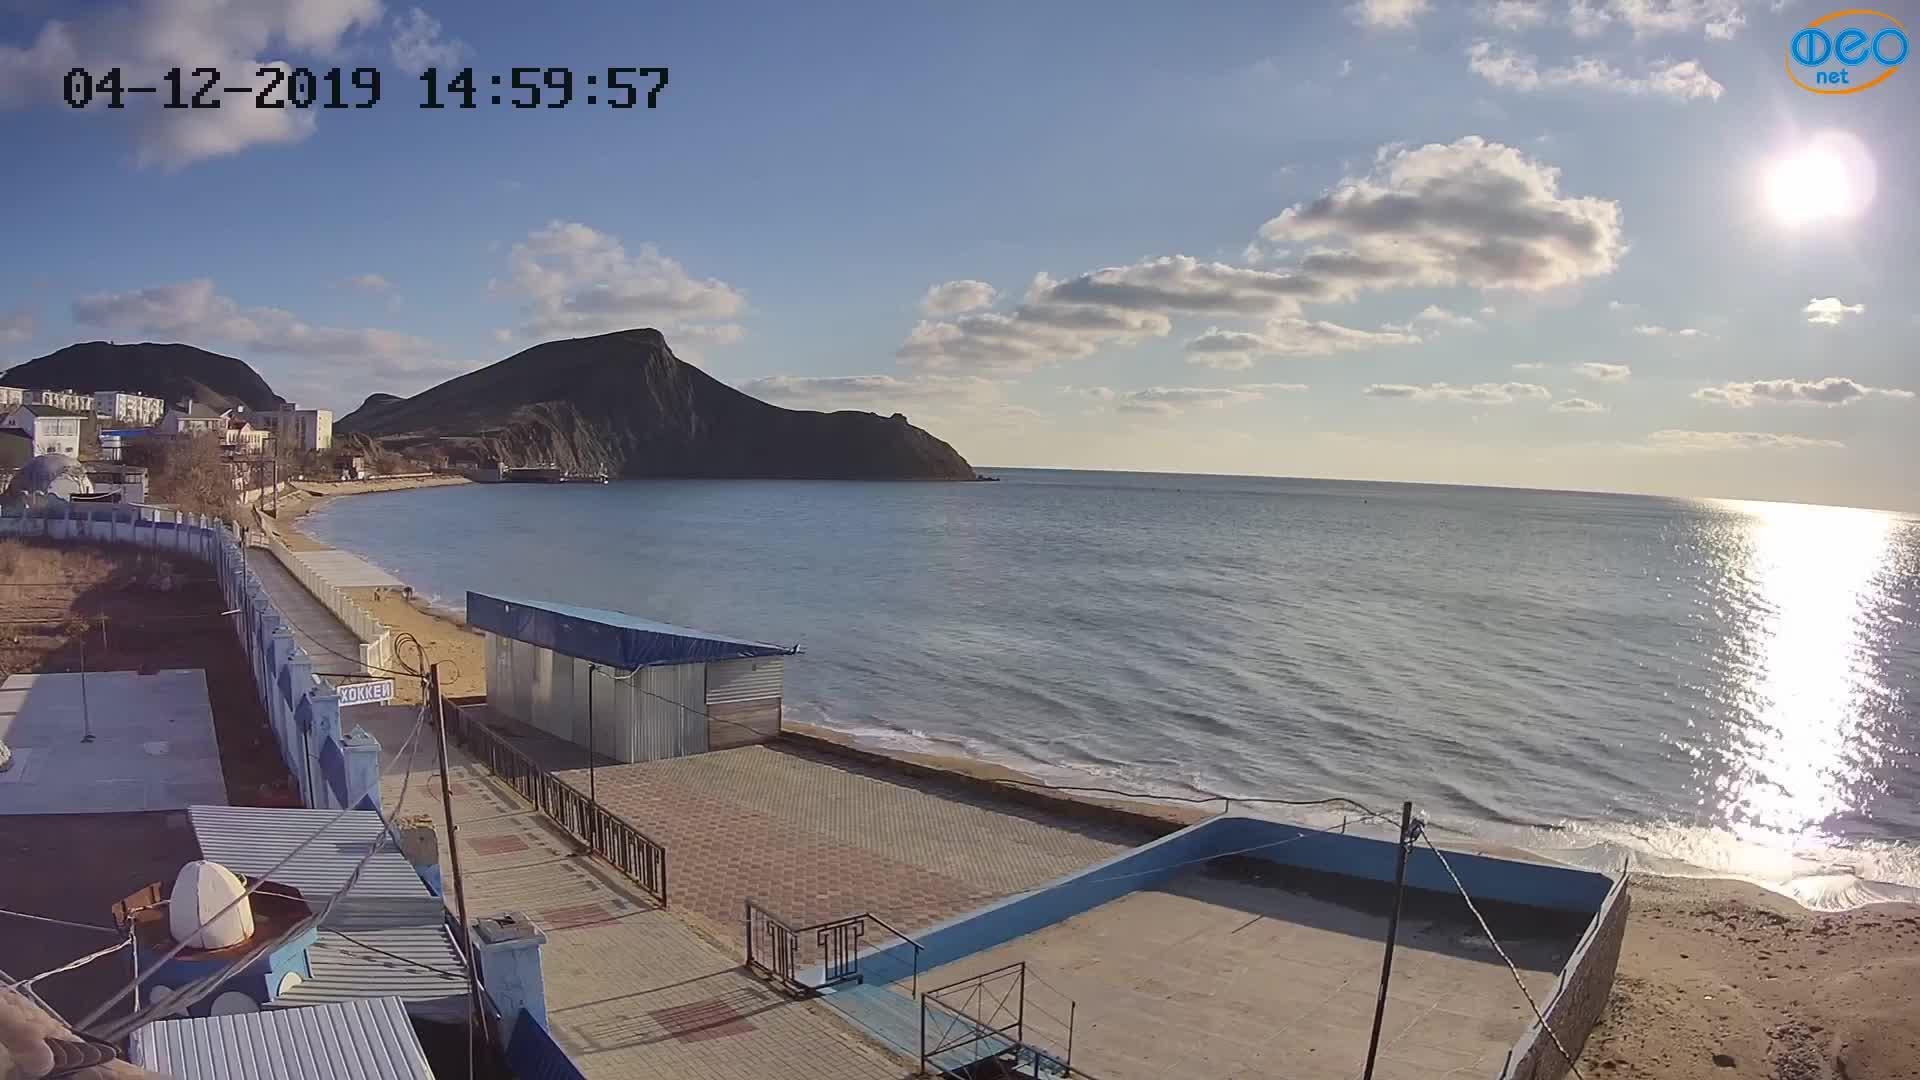 Веб-камеры Феодосии, Орджоникидзе - набережная - вид на Васюковку, 2019-12-04 15:15:41